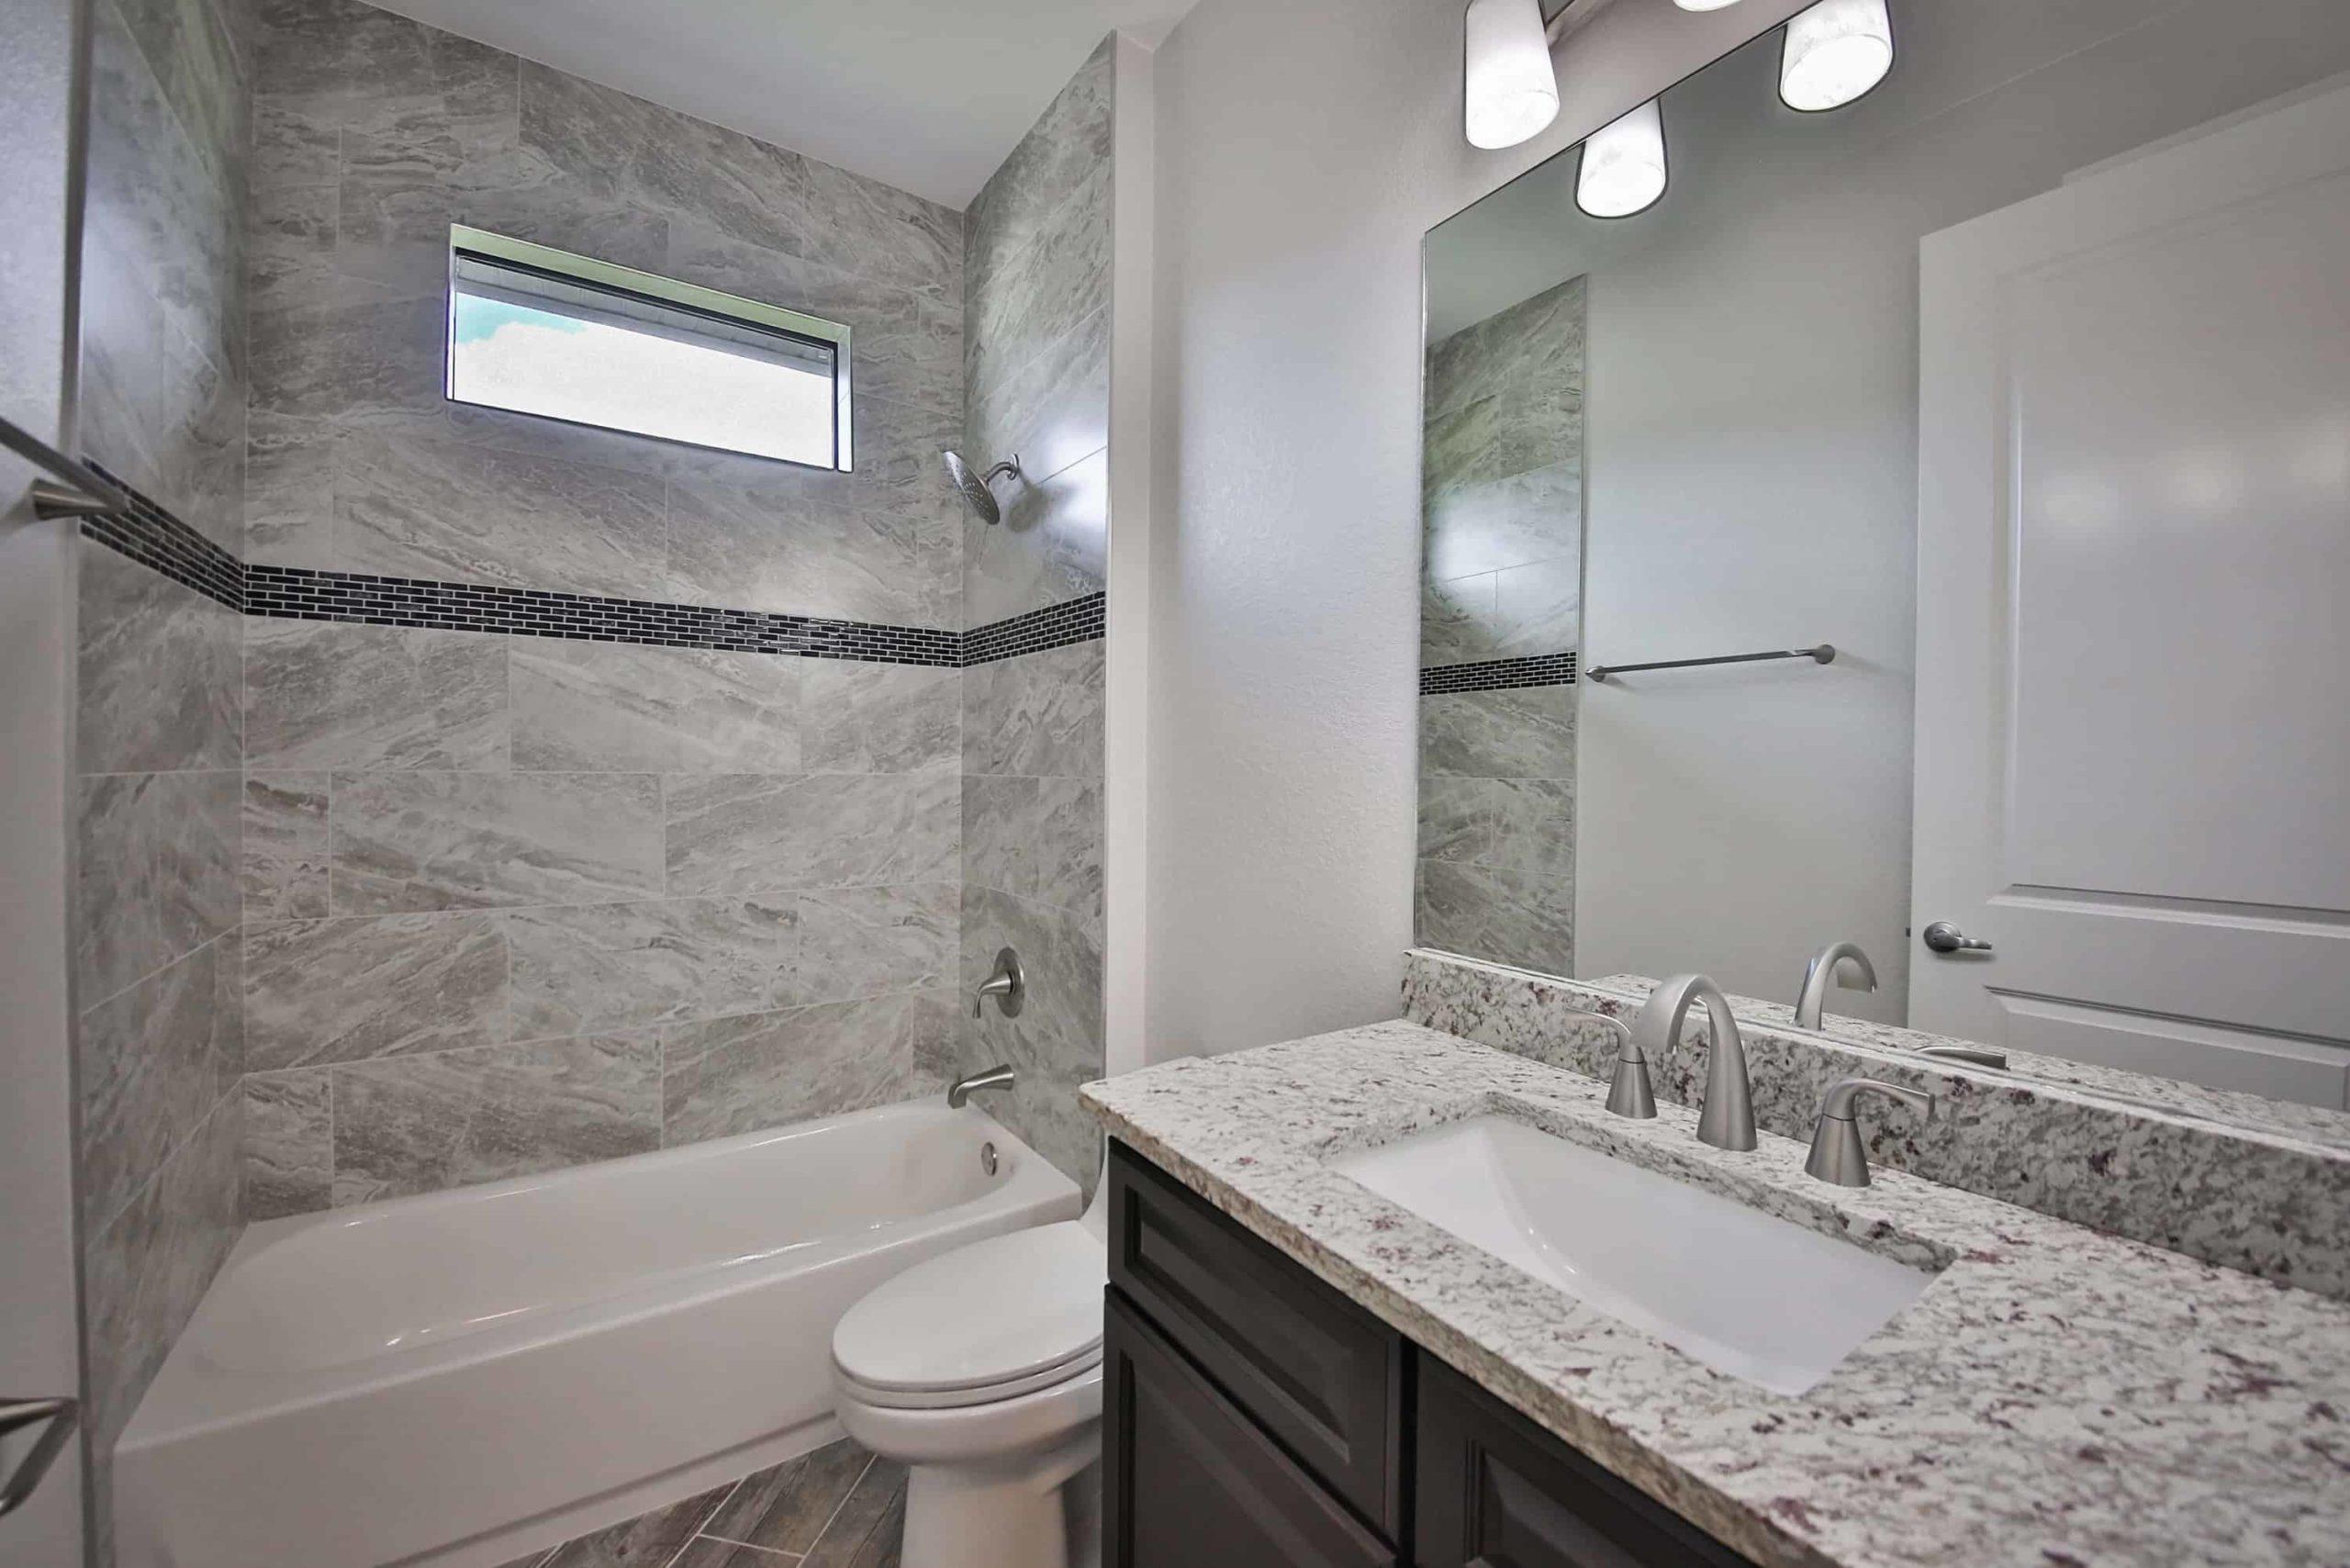 Gleason – 3 Bedroom 3 Bath 3 Car Garage